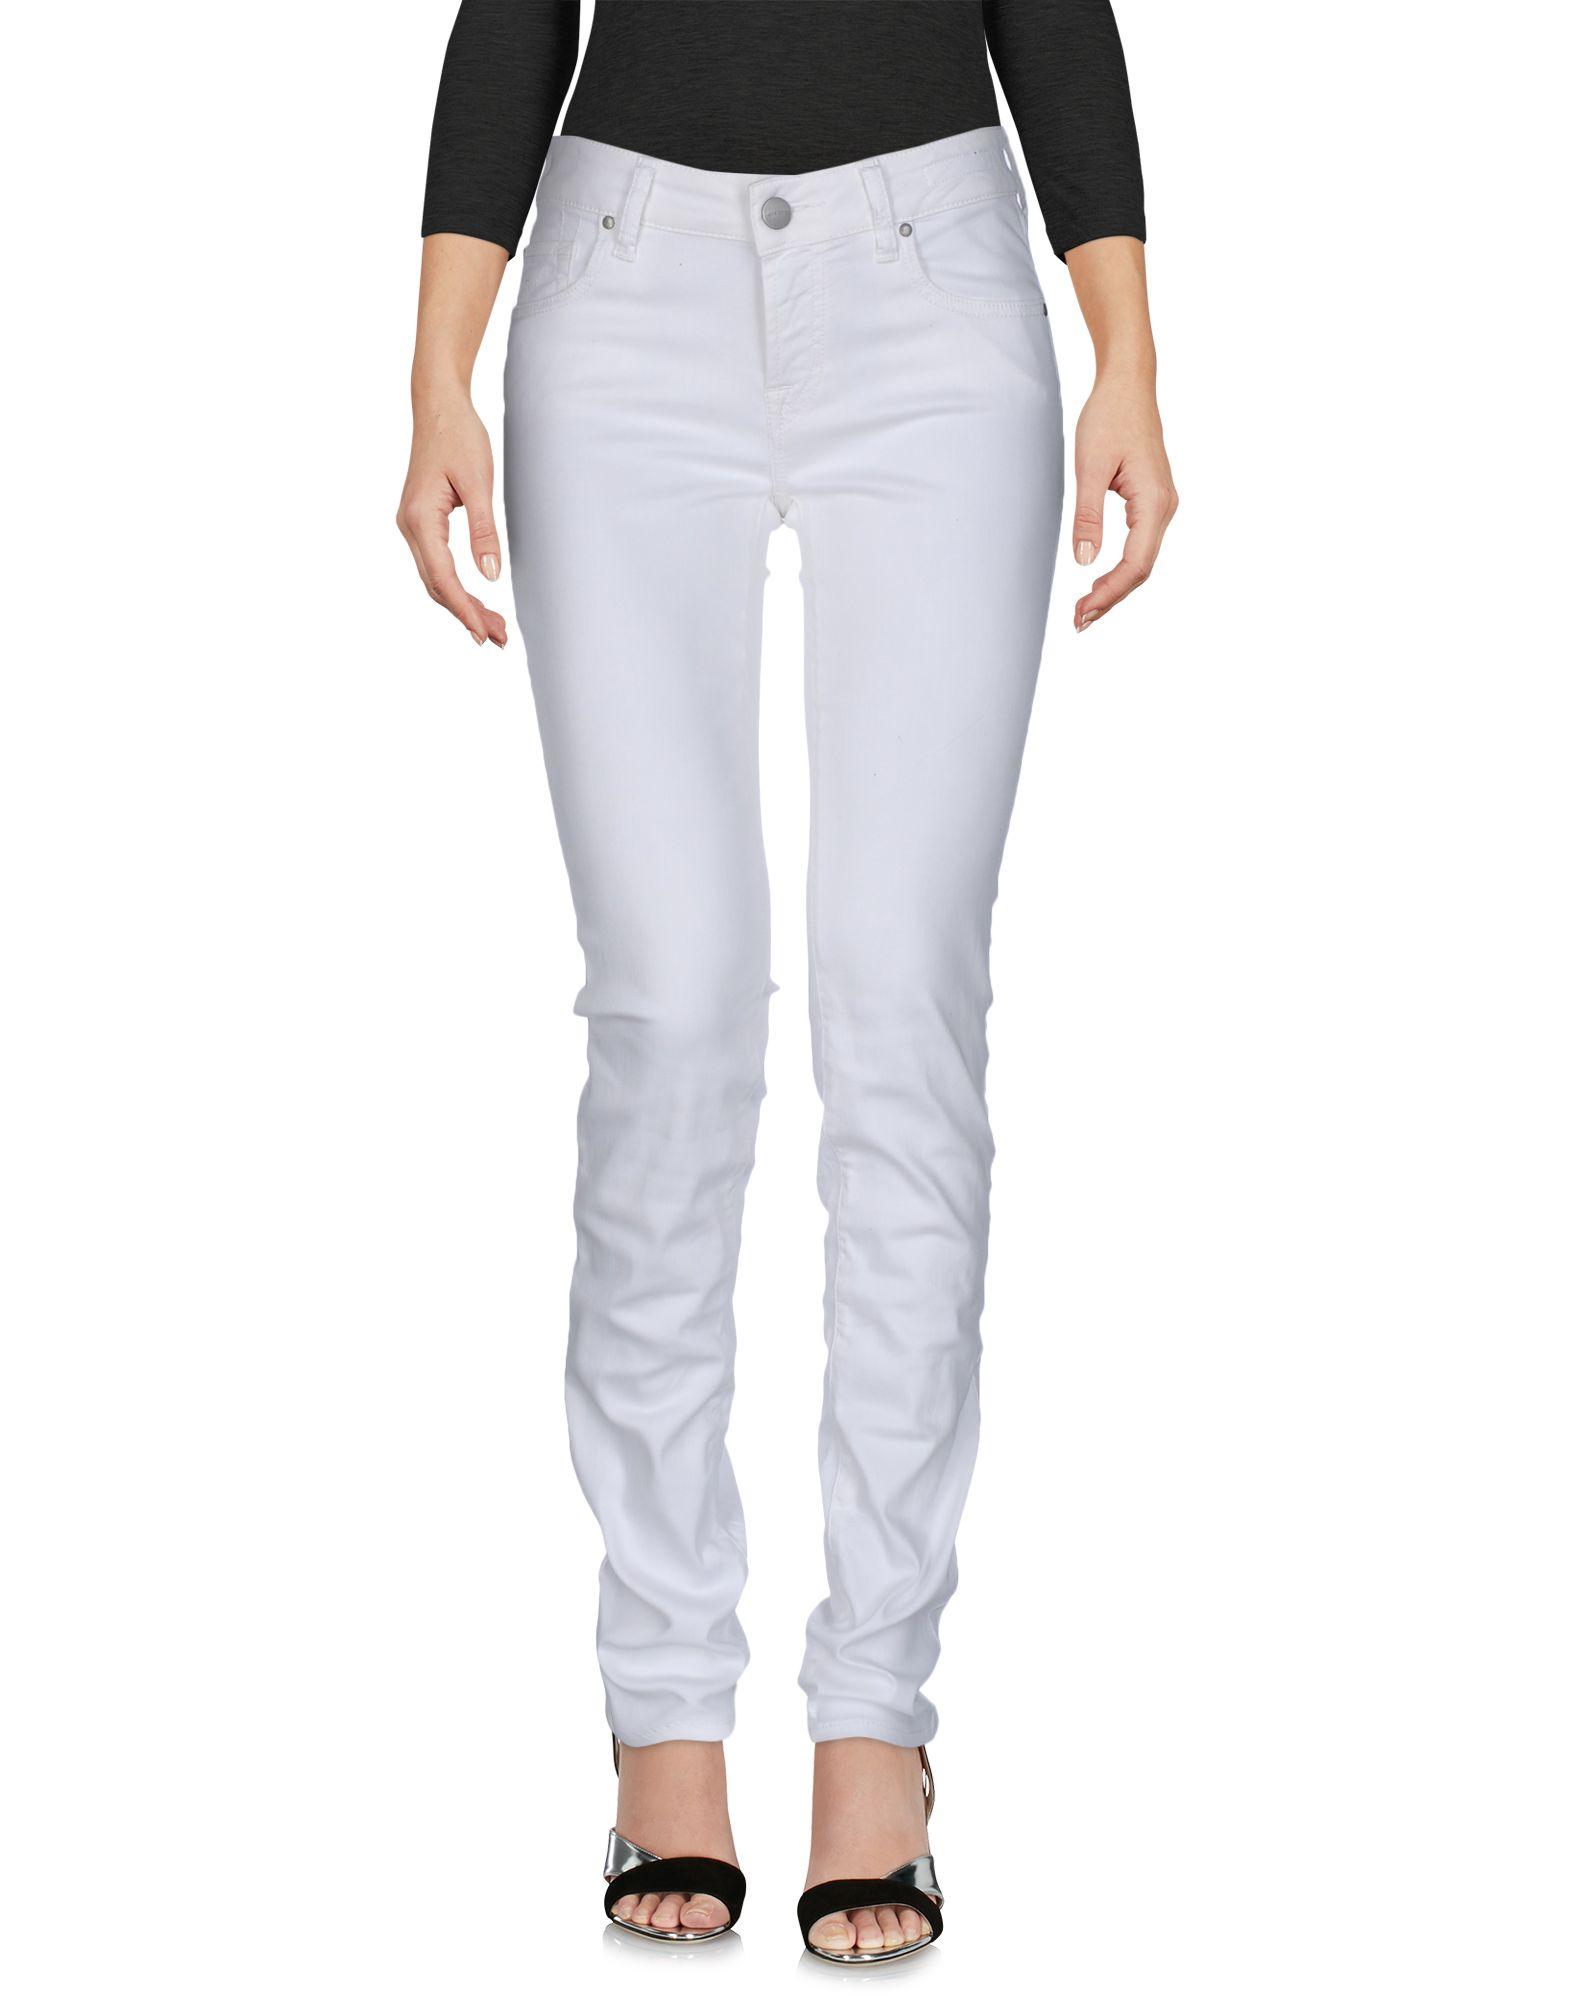 Pantaloni Jeans Jacob Cohёn Donna - Acquista online su HjA1hEBOM